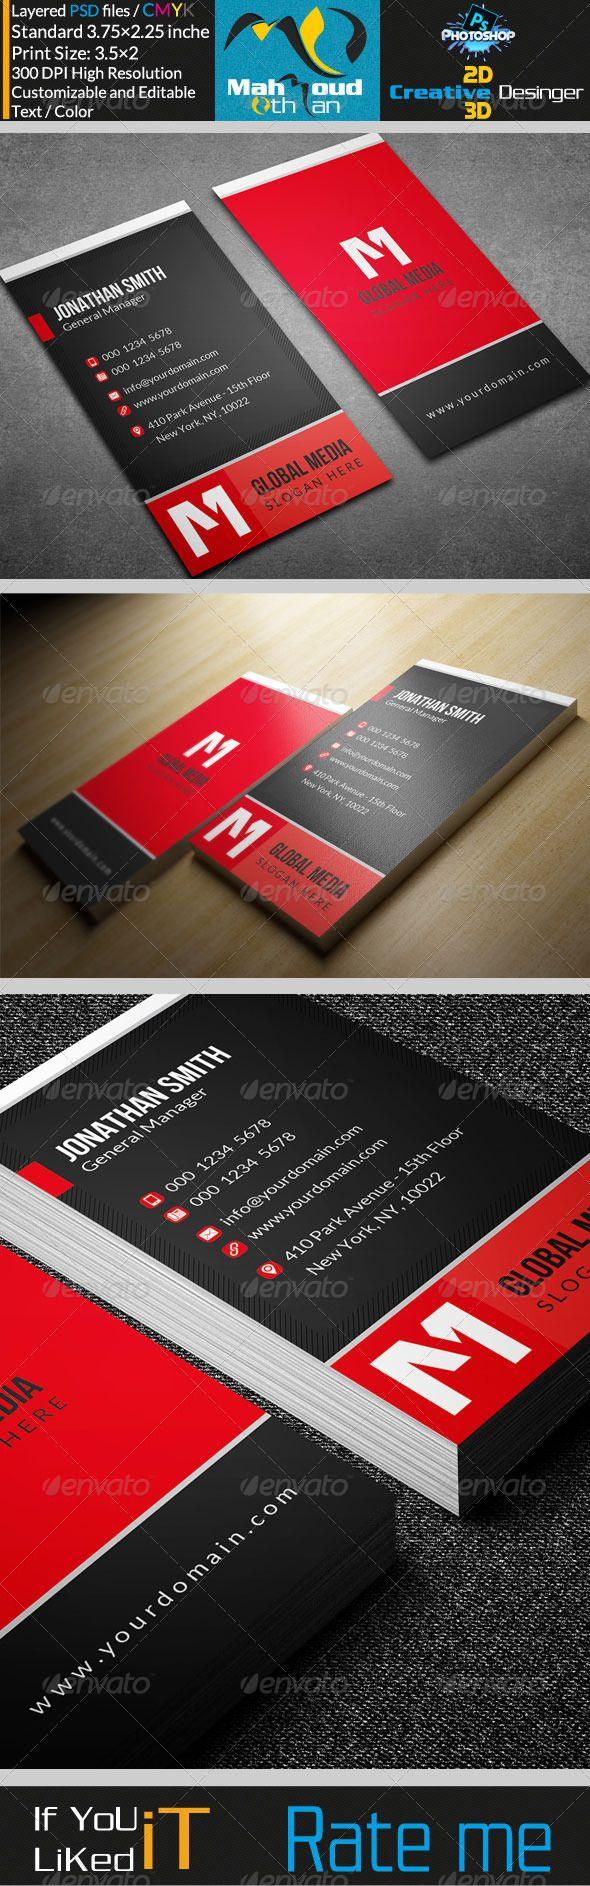 52 best business card images on Pinterest   Business card design ...